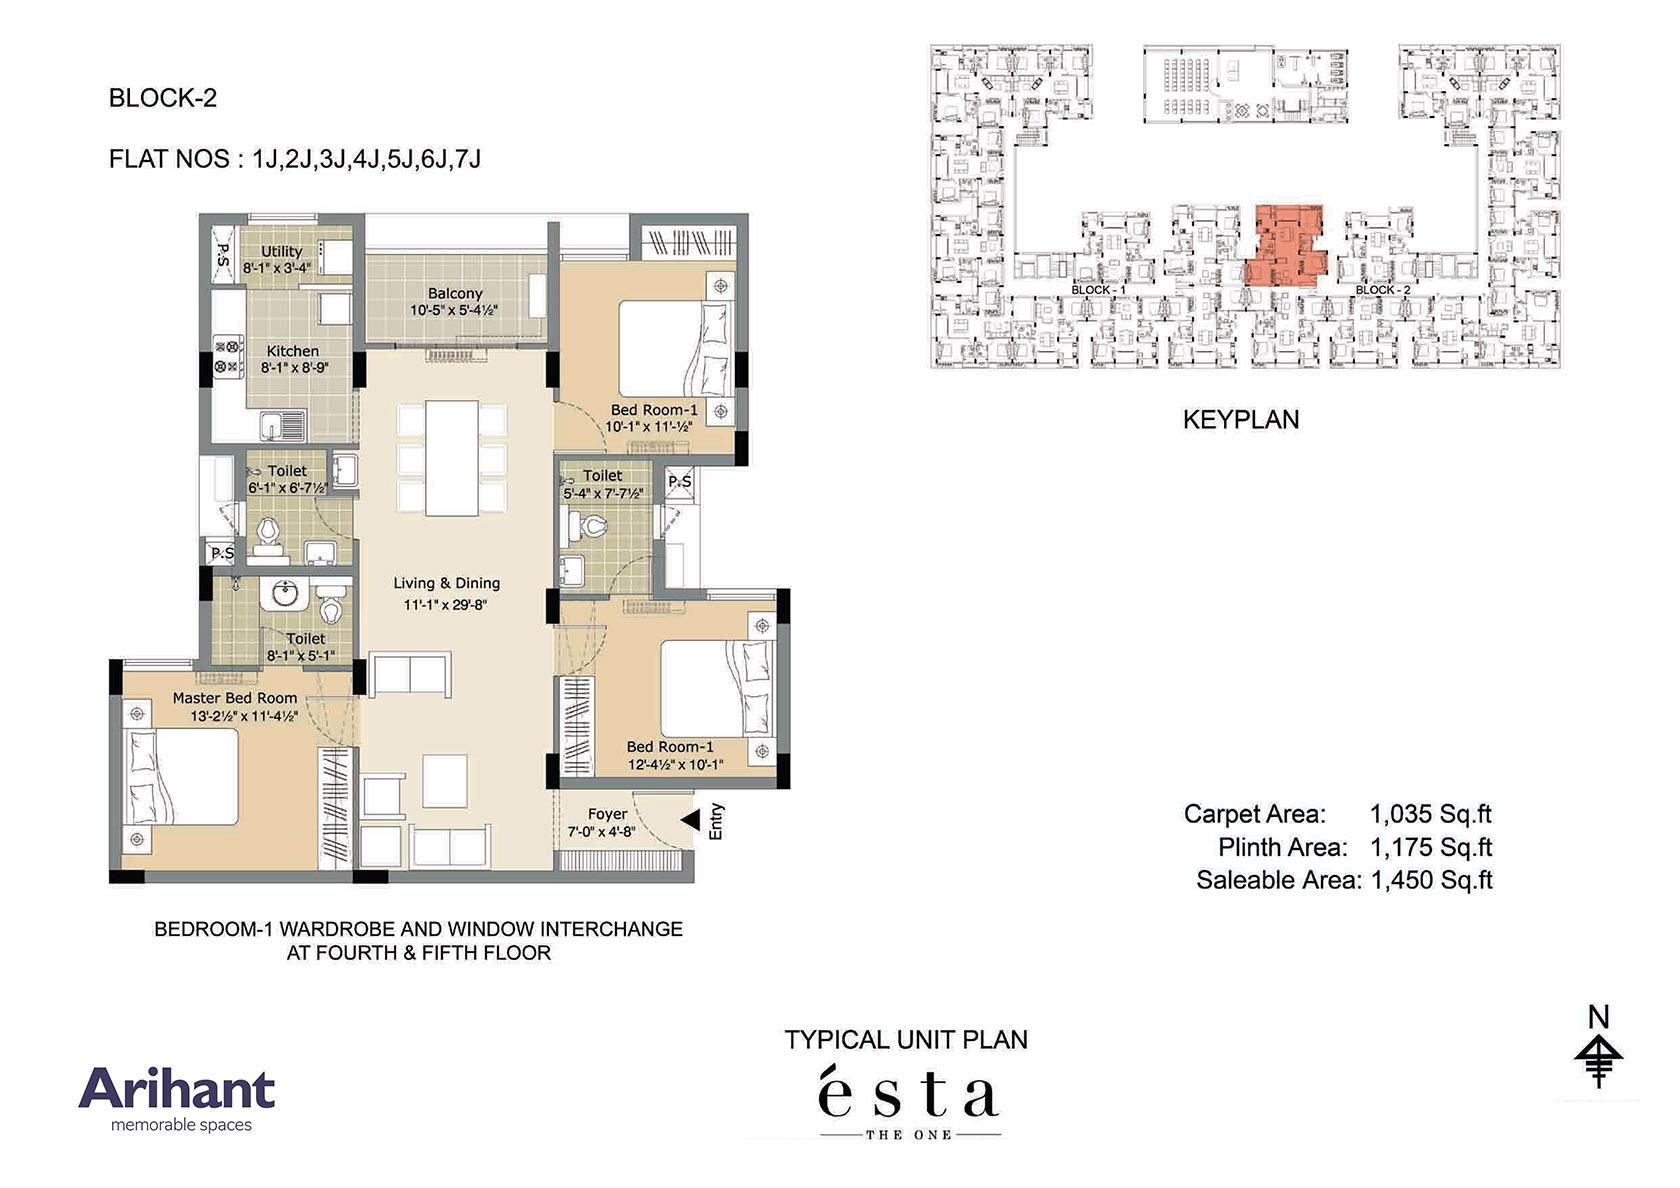 Arihant - Esta_Typical Unit Plan - Block 2 - Type J